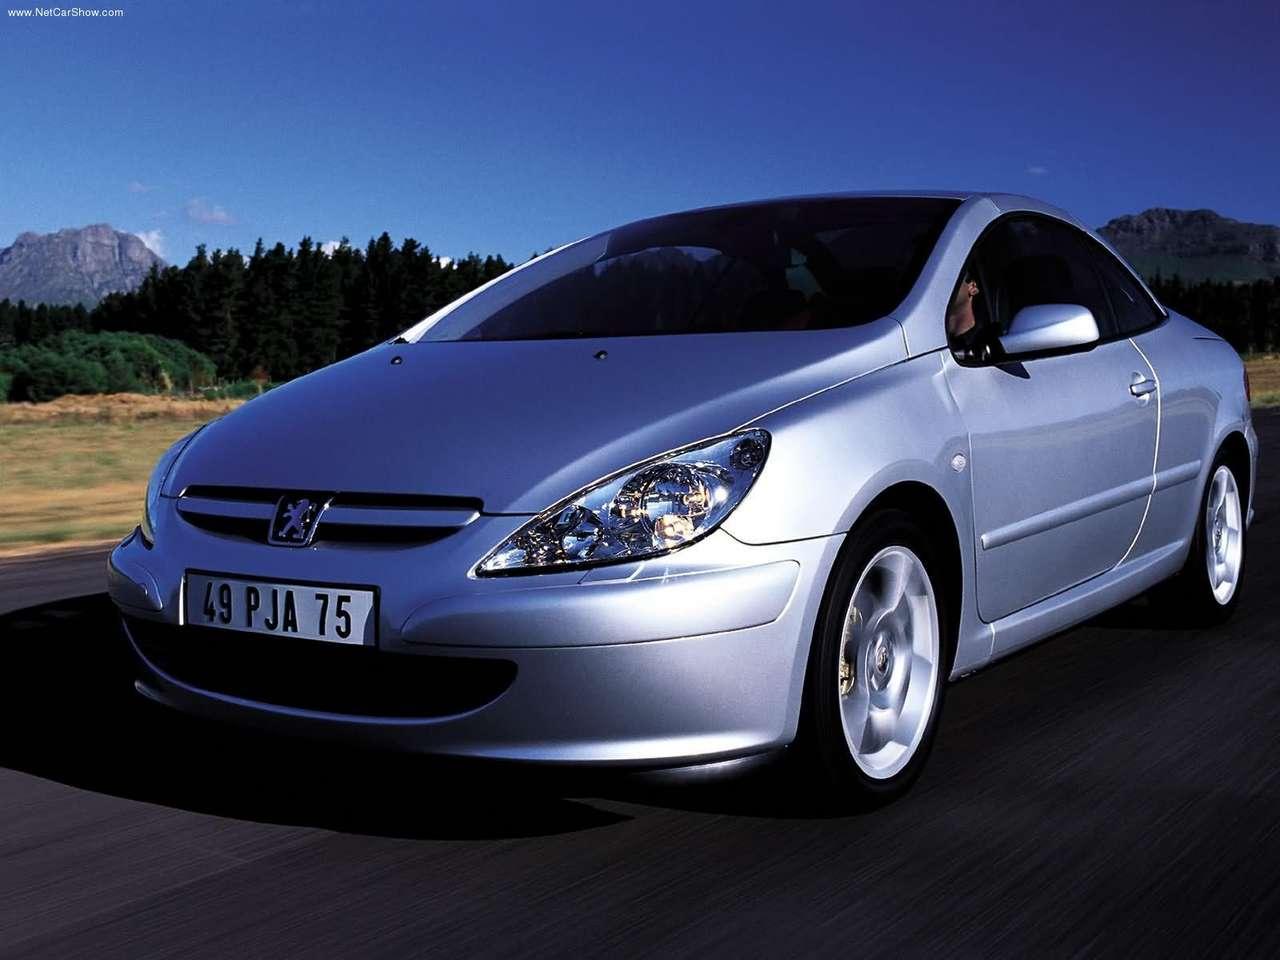 http://2.bp.blogspot.com/_xhqjRo6NERQ/S8nLrby9UUI/AAAAAAAAIXo/FPxyIPxw2nY/s1600/Peugeot-307_CC_2003_1280x960_wallpaper_02.jpg